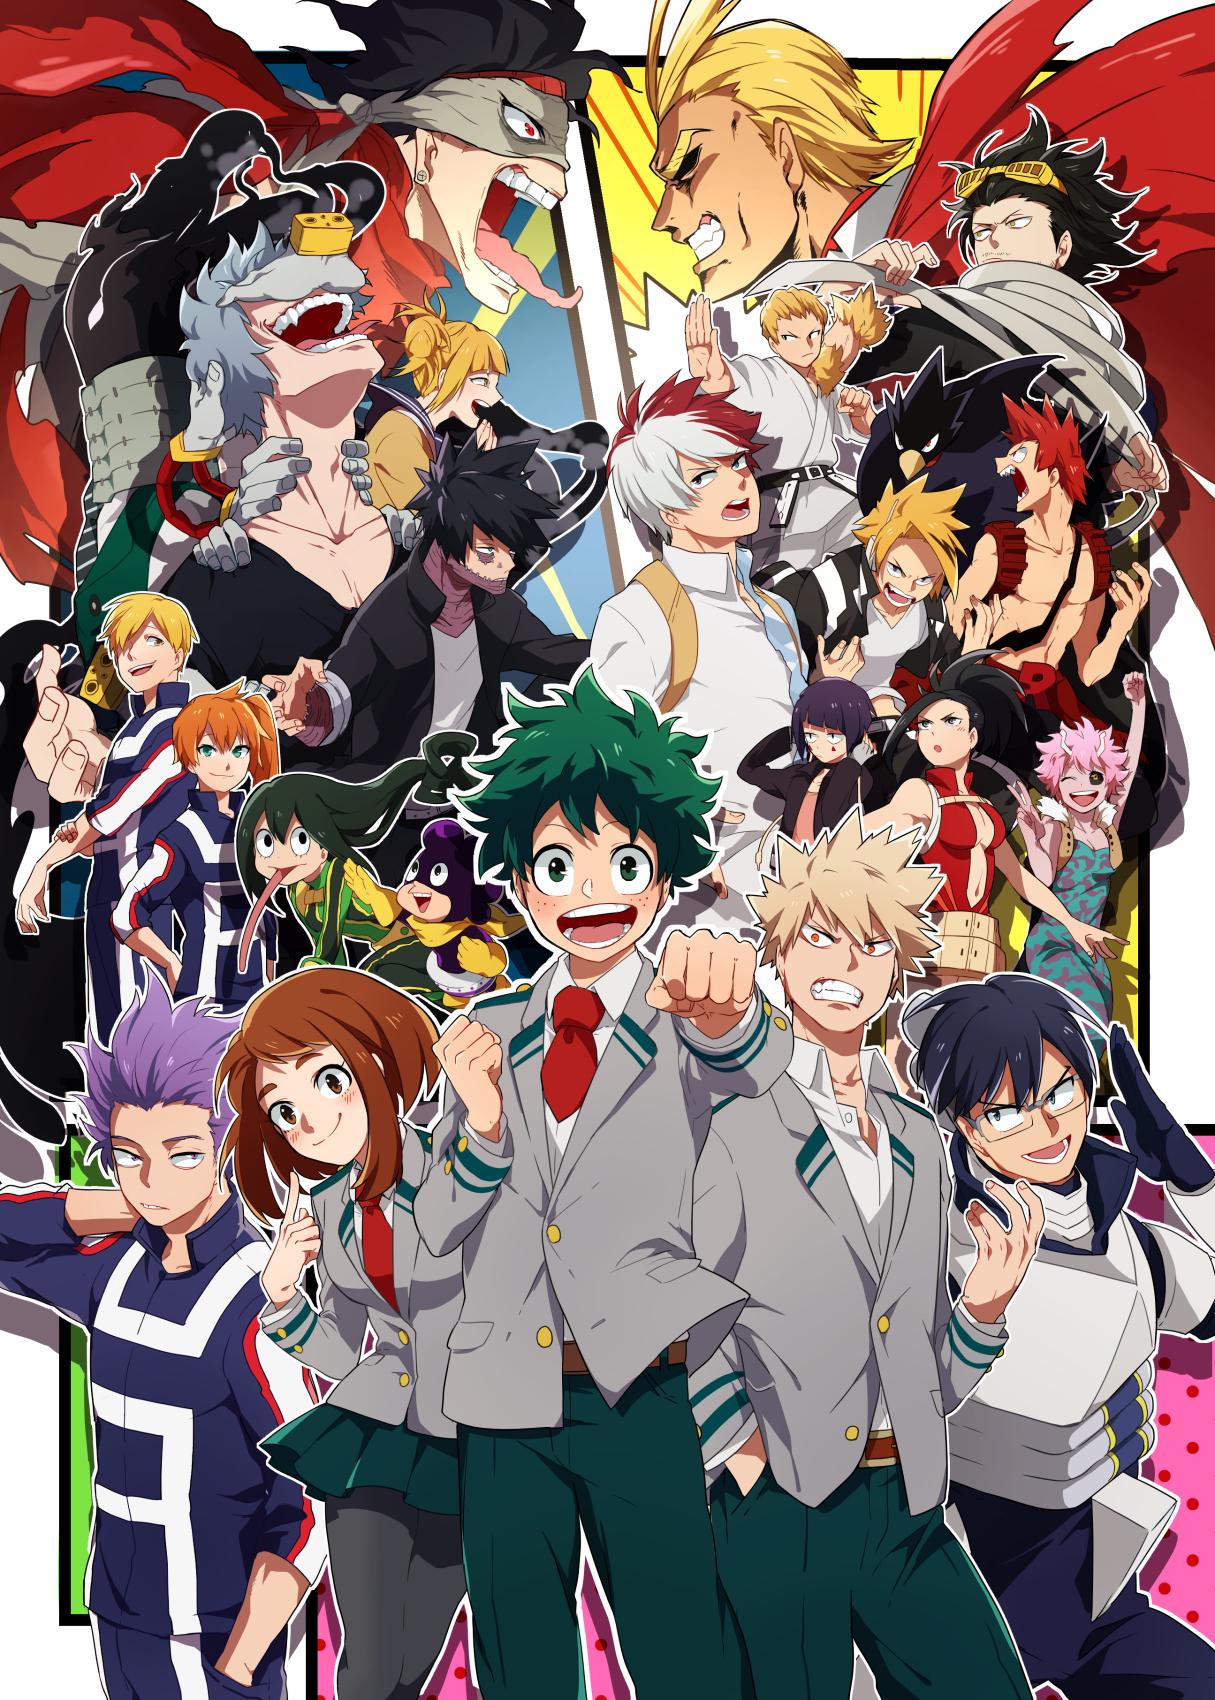 Hd wallpaper boku no hero academia - Boku No Hero Academia Fondo De Pantalla Possibly Containing Anime Titled Boku No Hero Academia